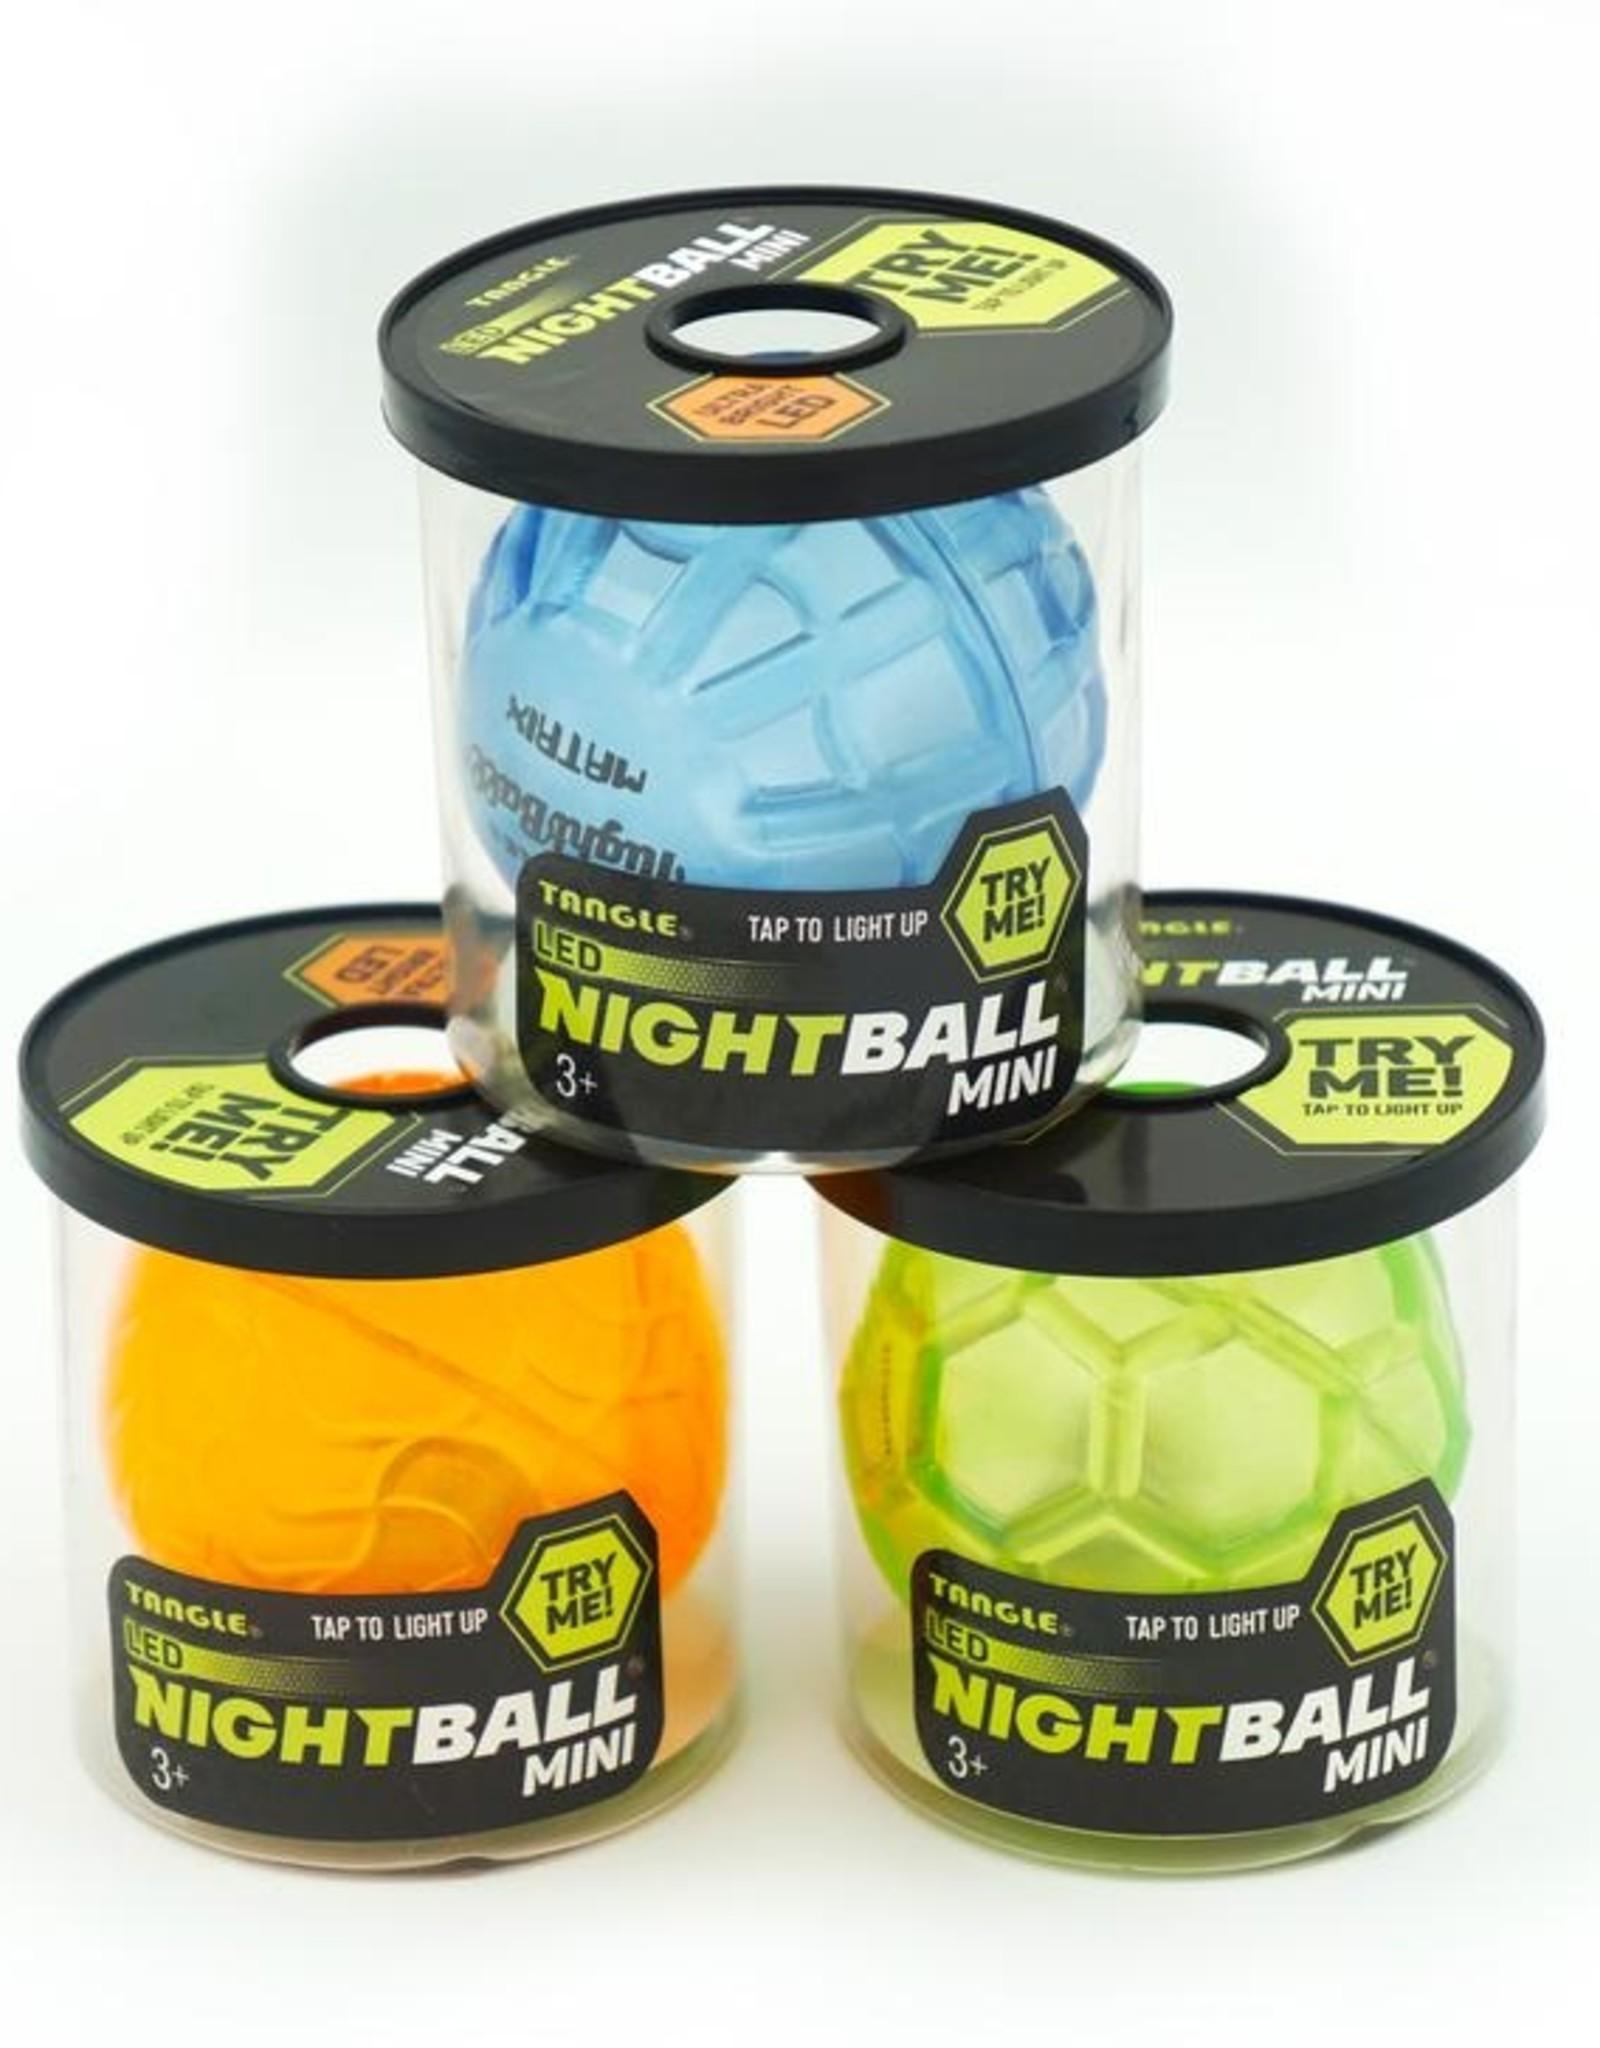 Tangle LED Lightball Mini